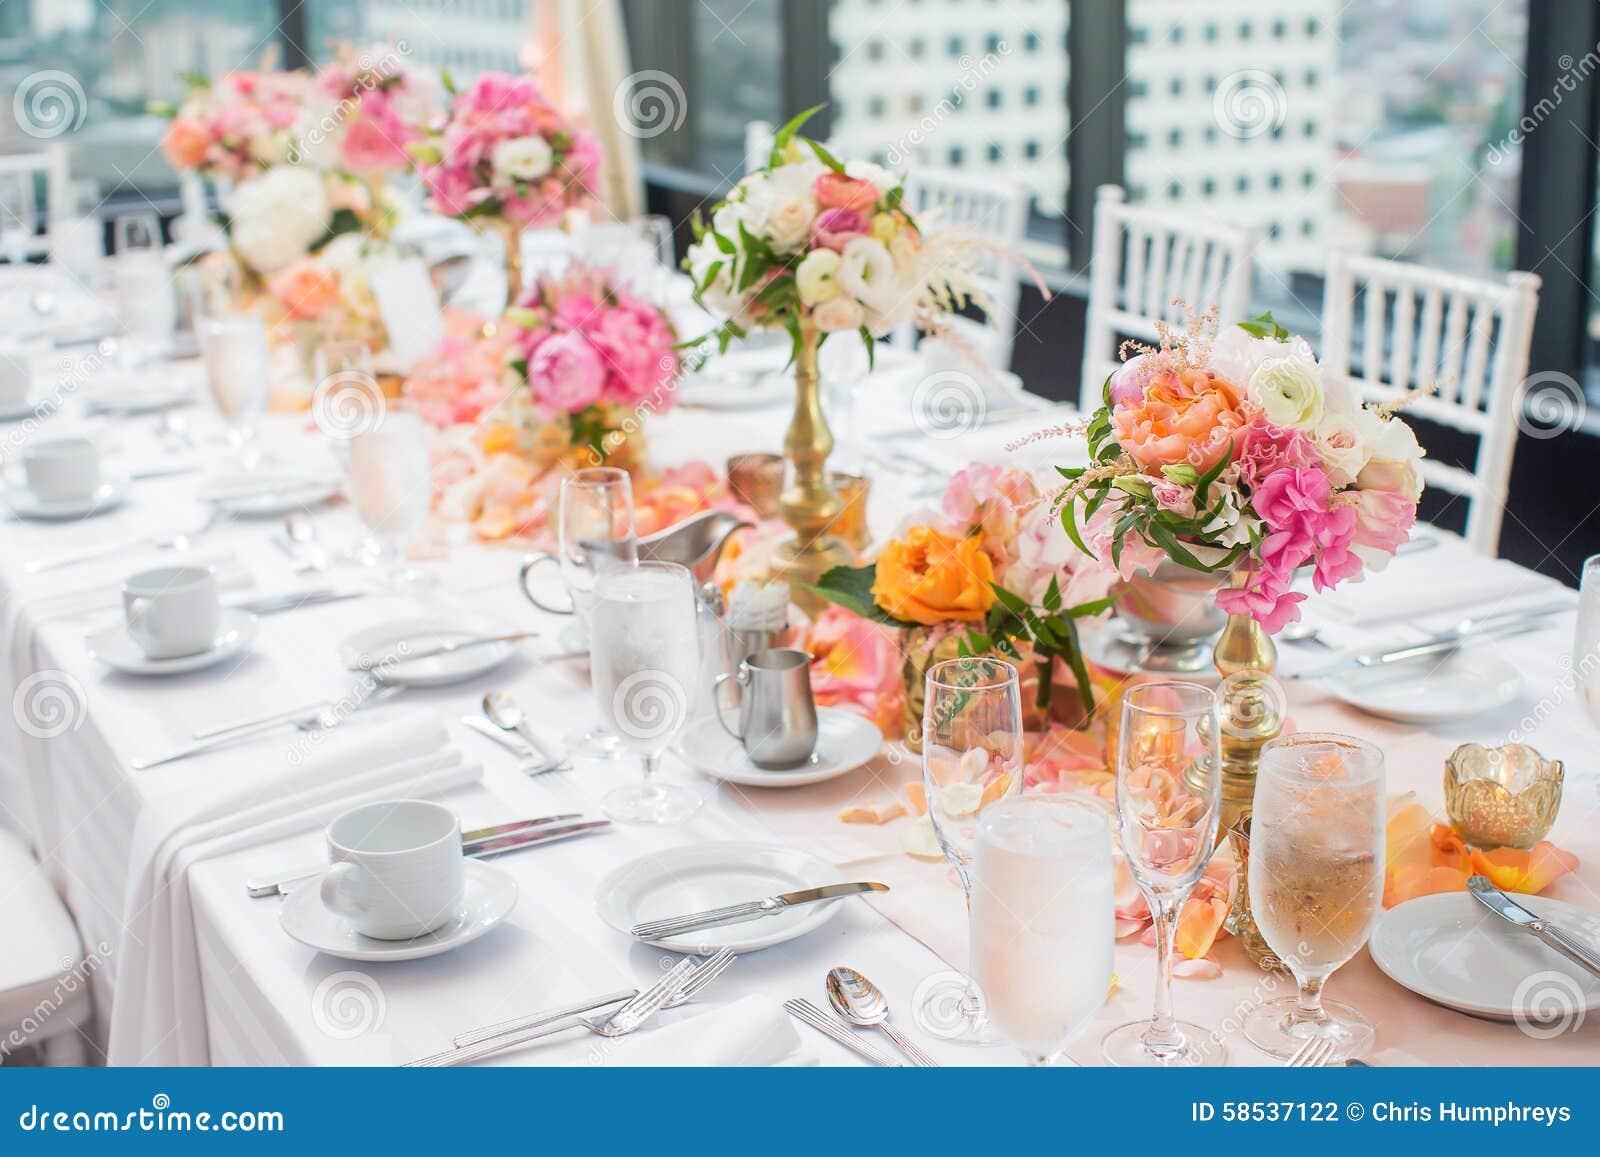 Wedding Reception Centerpieces Stock Photo Image 58537122 : elegant wedding reception table decor centerpieces hotel ballroom 58537122 from www.dreamstime.com size 1300 x 957 jpeg 159kB